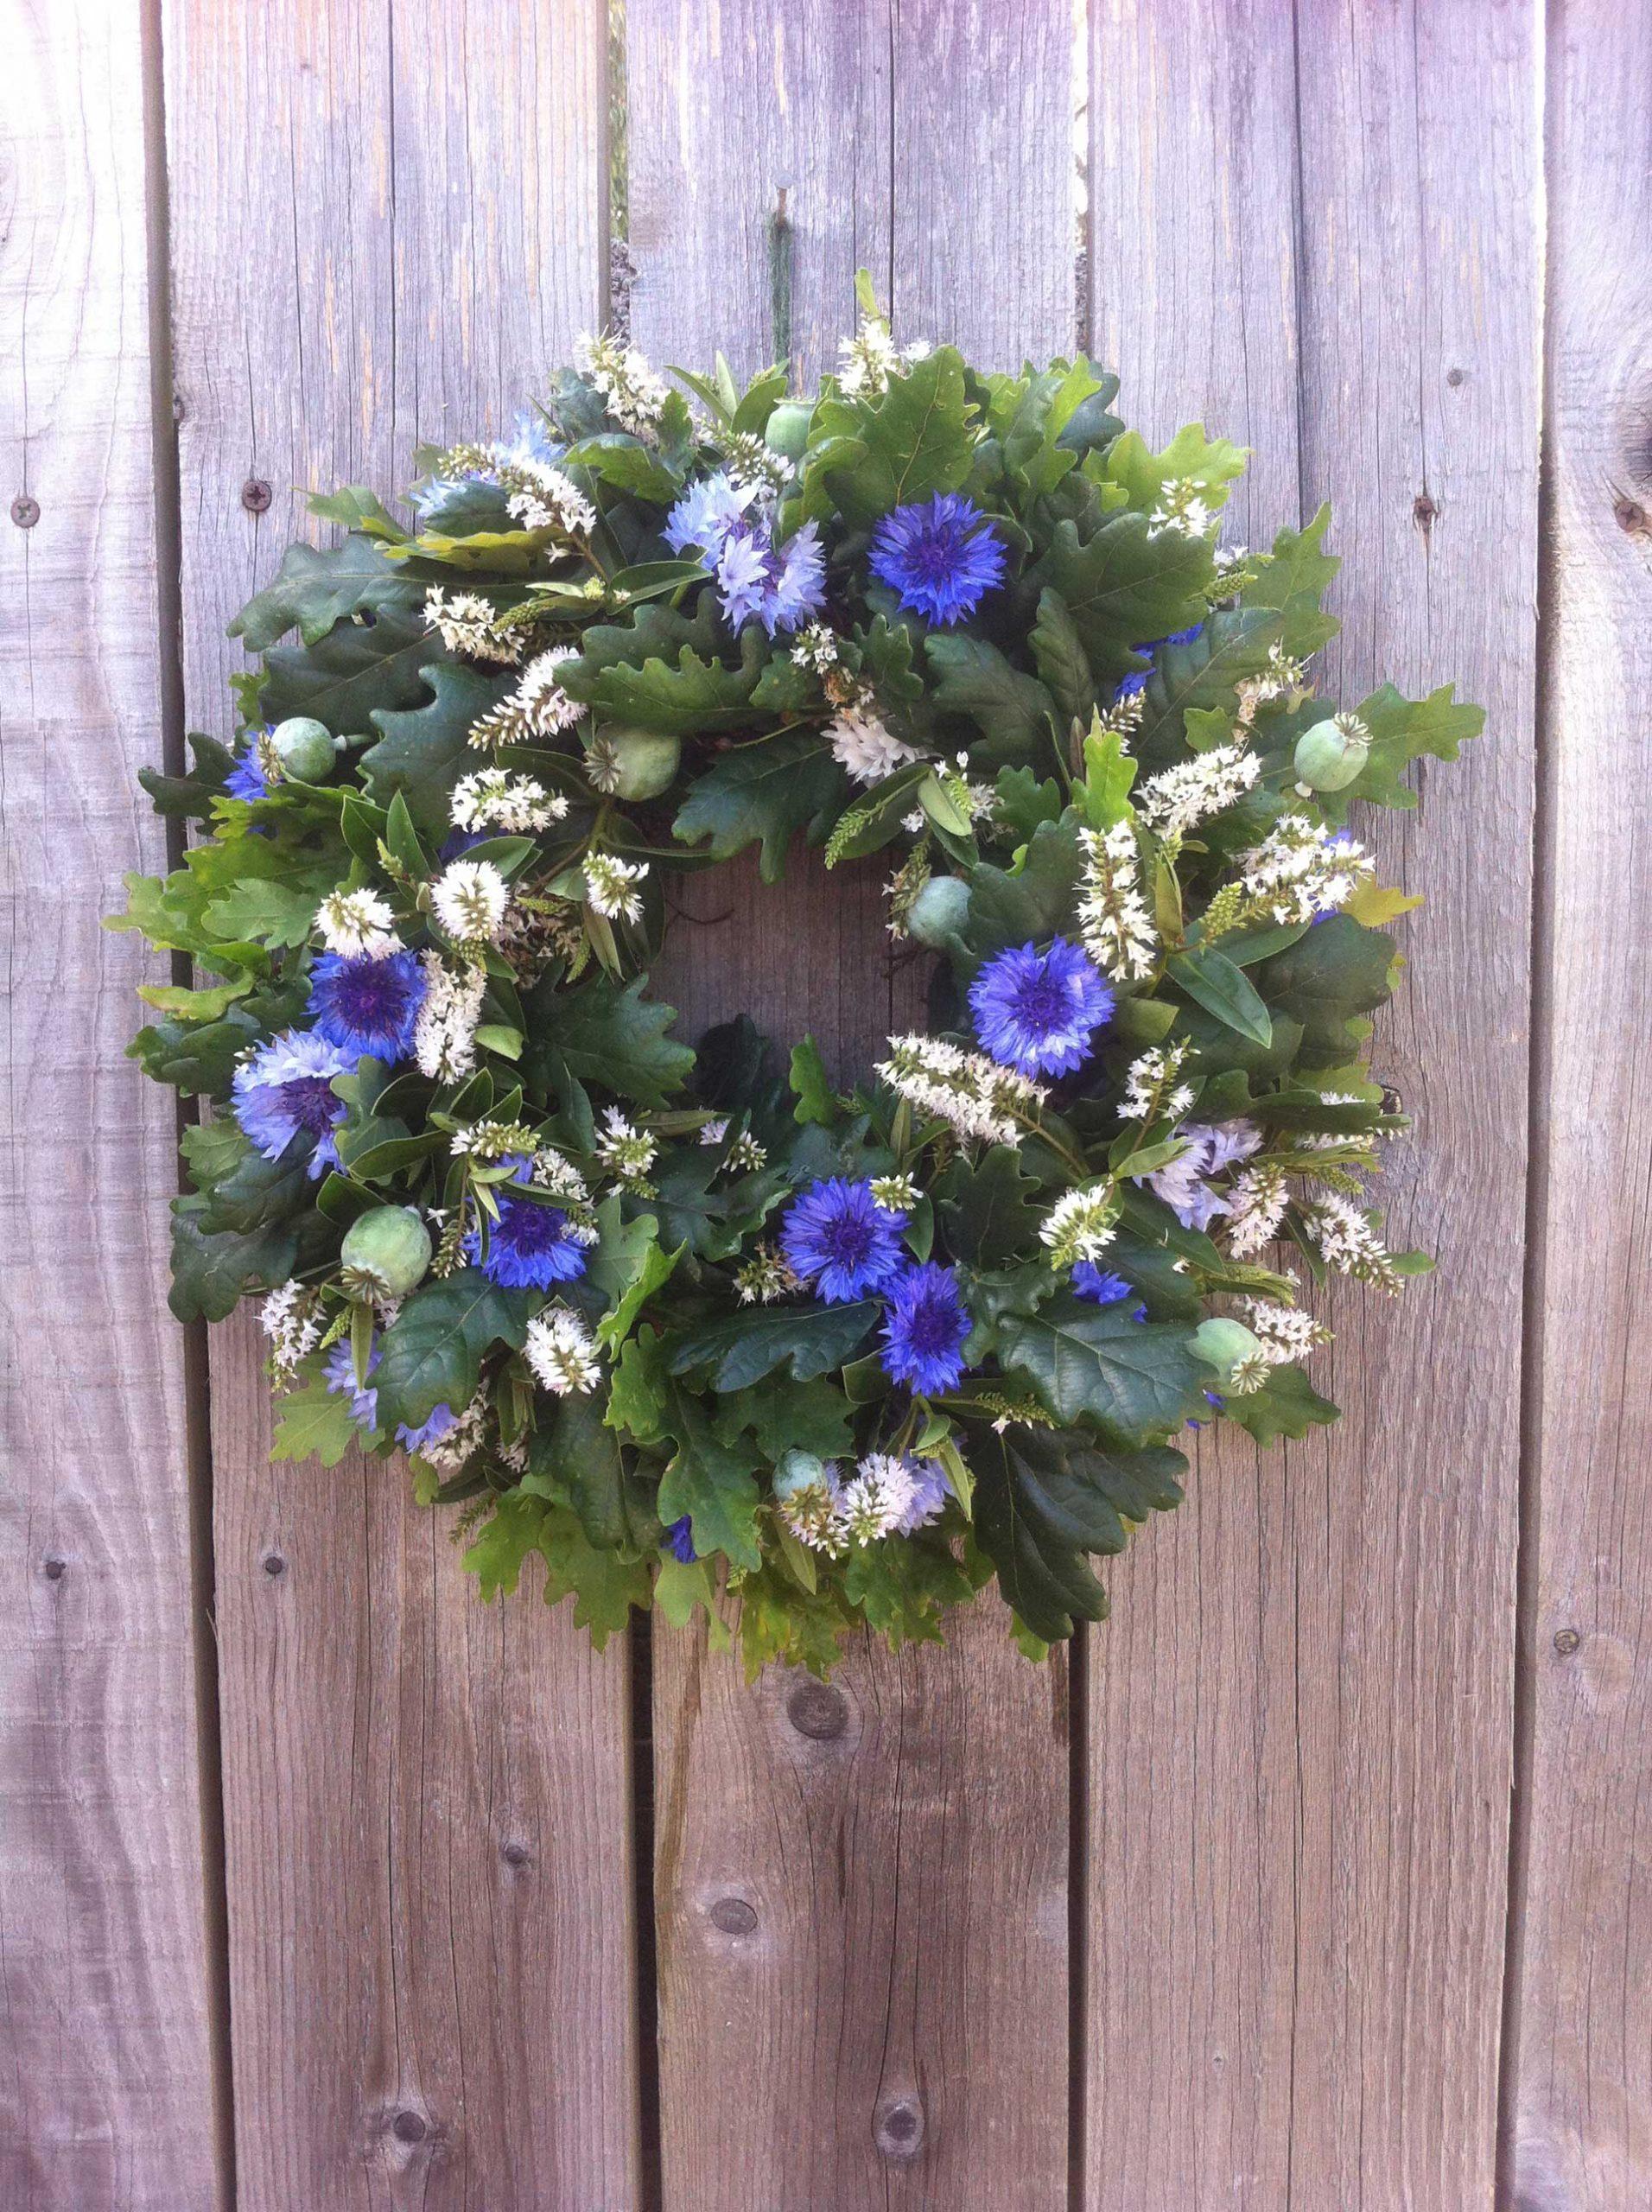 Summer wreath by Zanna from S P I N D L E in Dorset